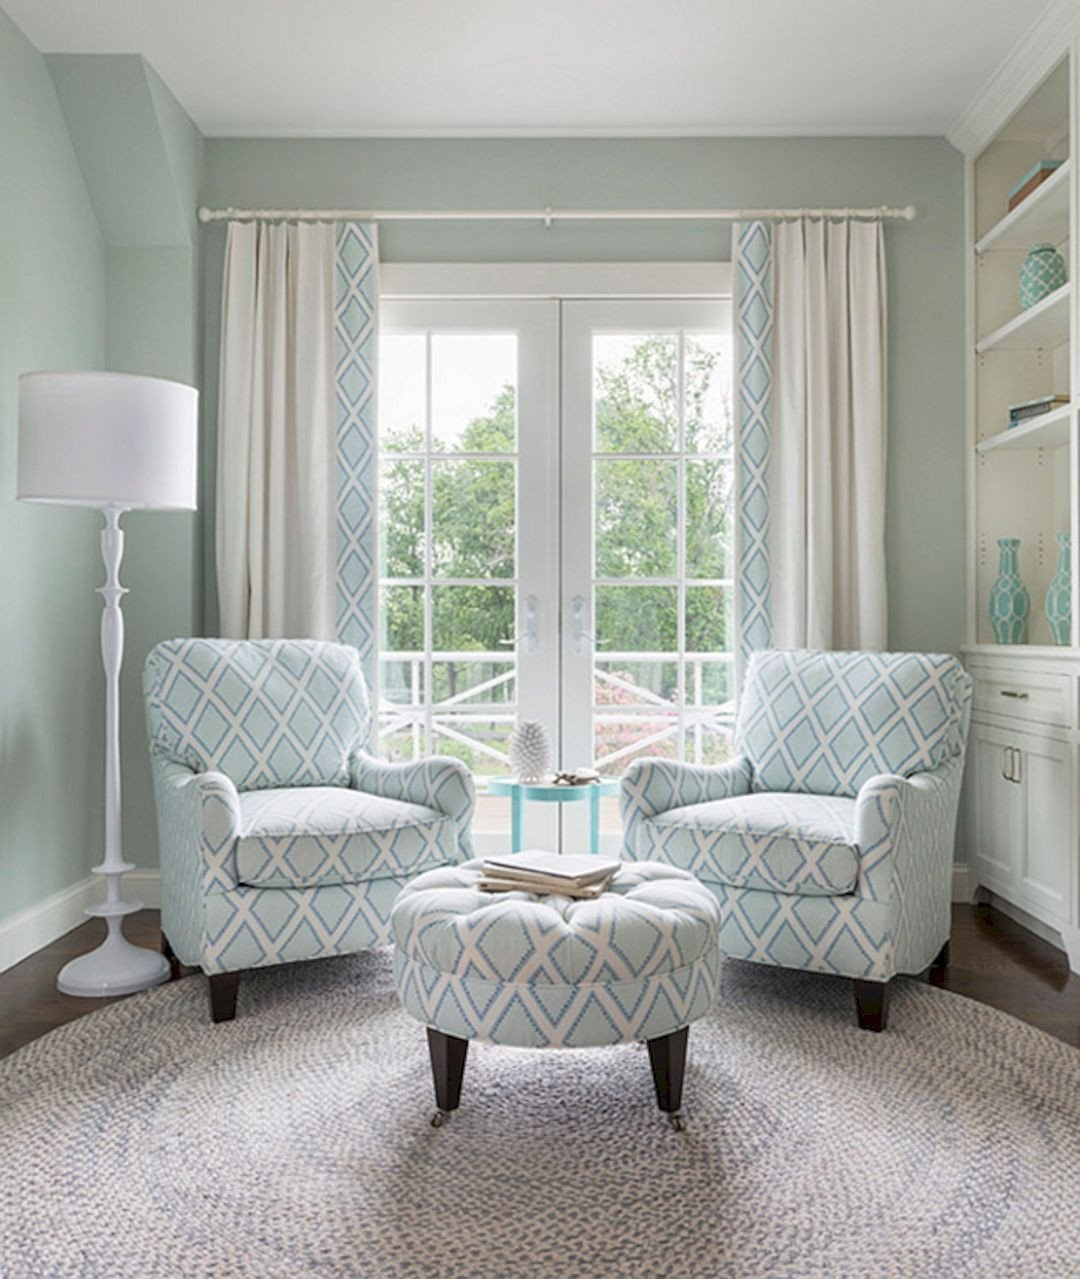 Bedroom Sitting area Ideas New Cozy Master Sitting Room Idea 53